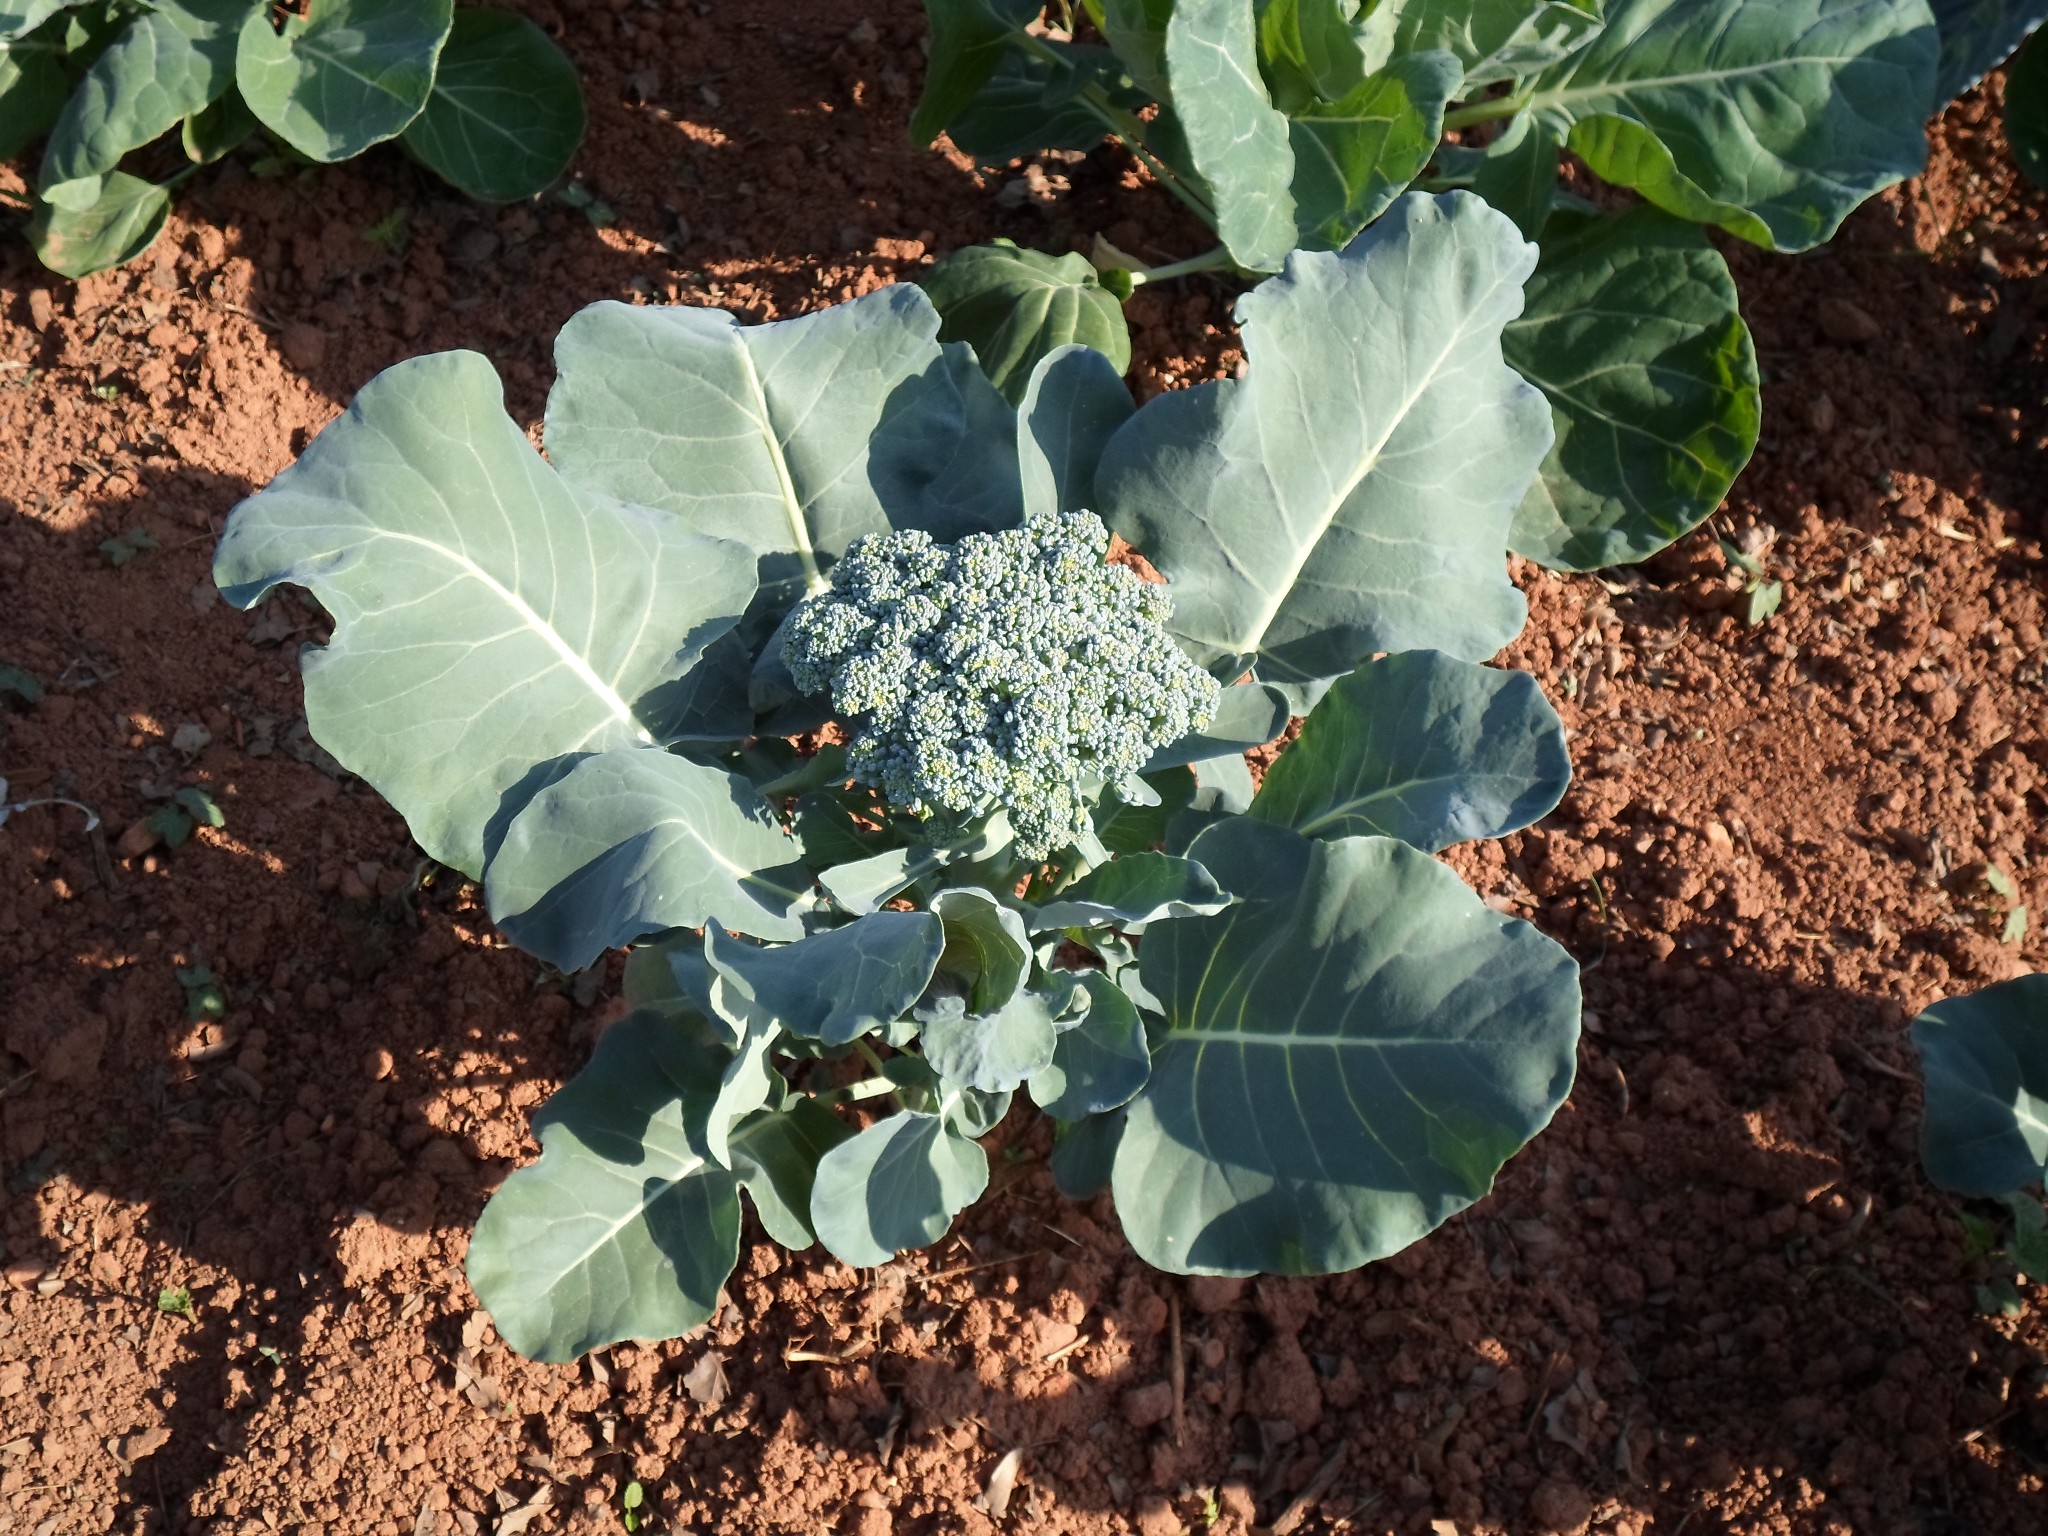 Photo: Broccoli